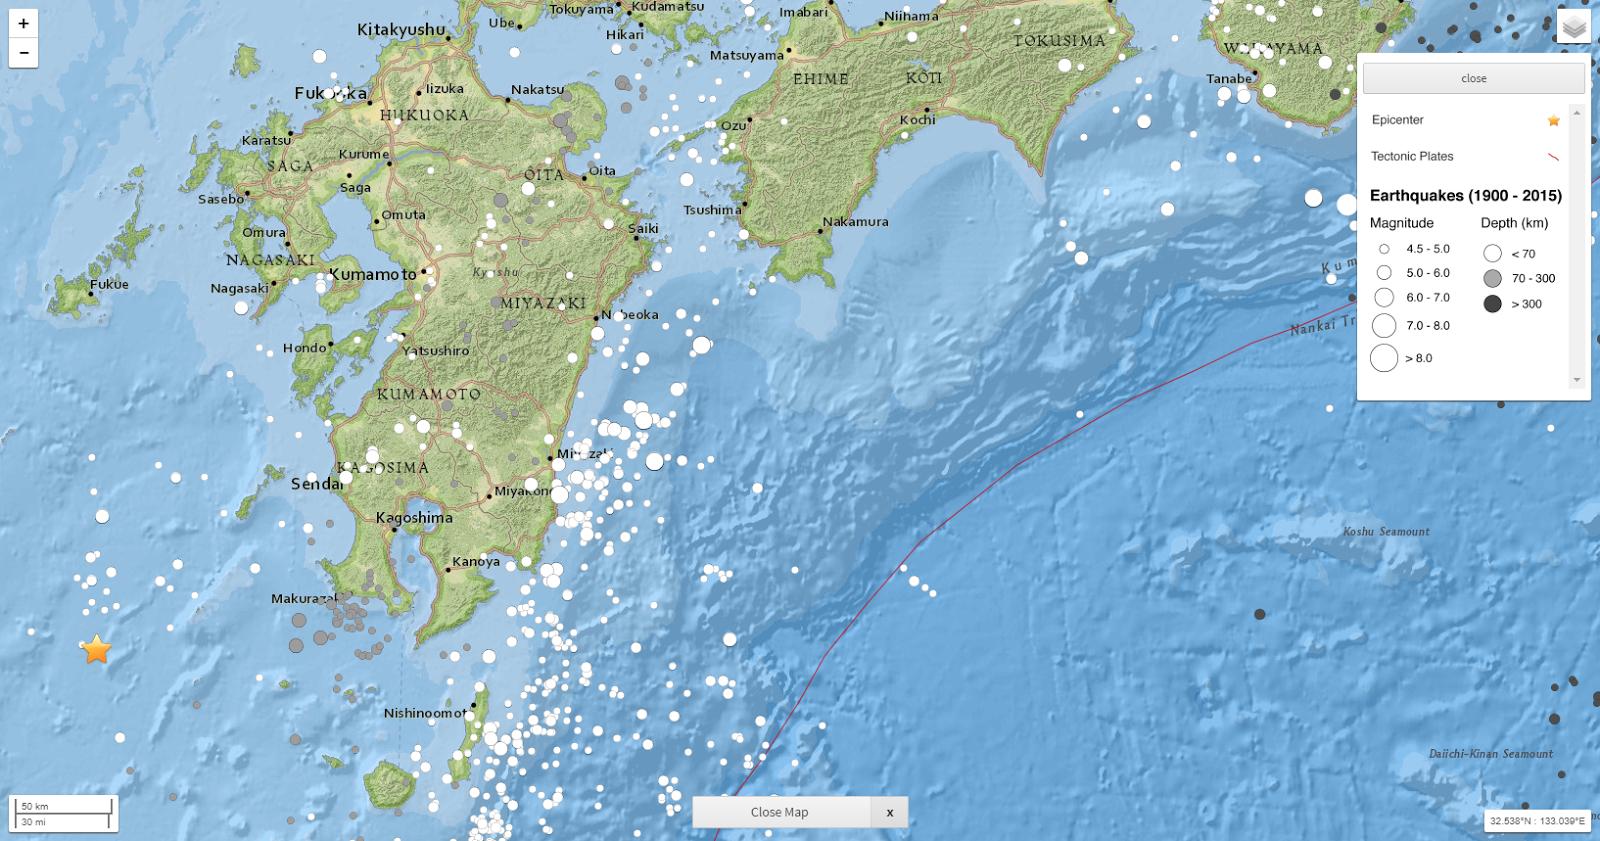 seismotectonics of area of southwestern japan around kagoshima earthquake of november 2015 u s geological survey usgs via usgs earthquake hazards